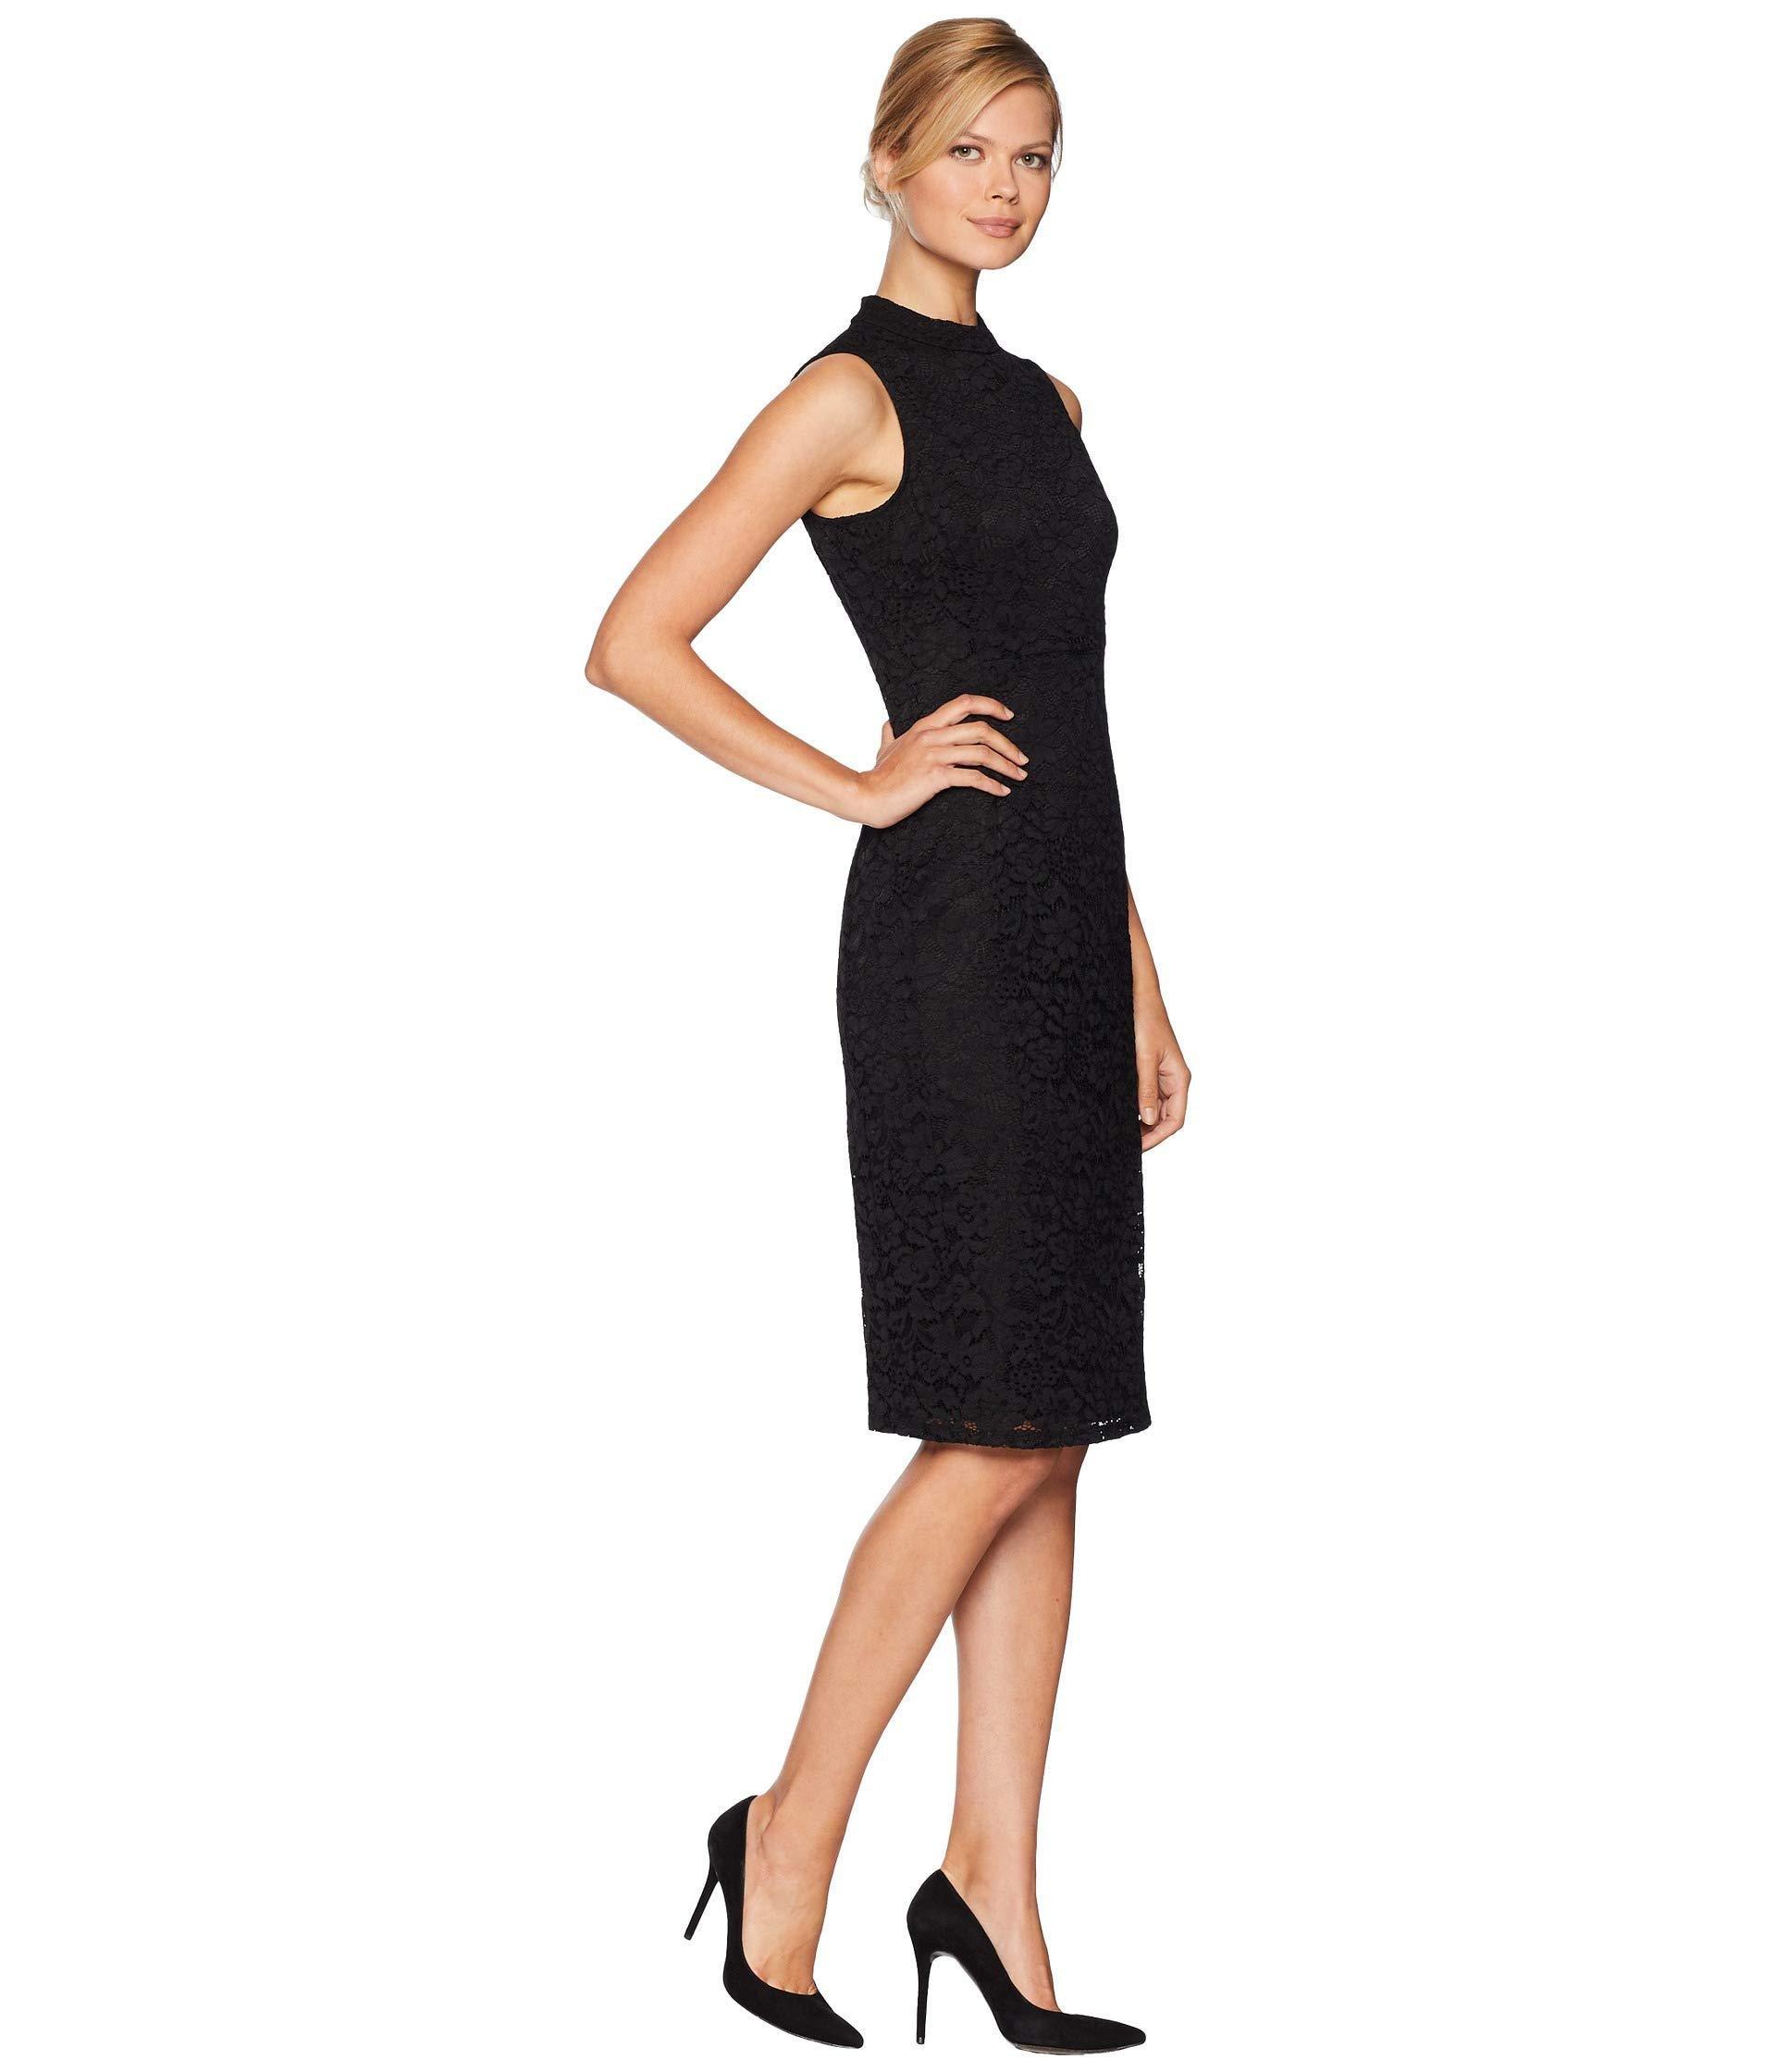 e546c644ae9bd Nine West - Black Lace Mock Turtleneck Sheath Dress - Lyst. View fullscreen